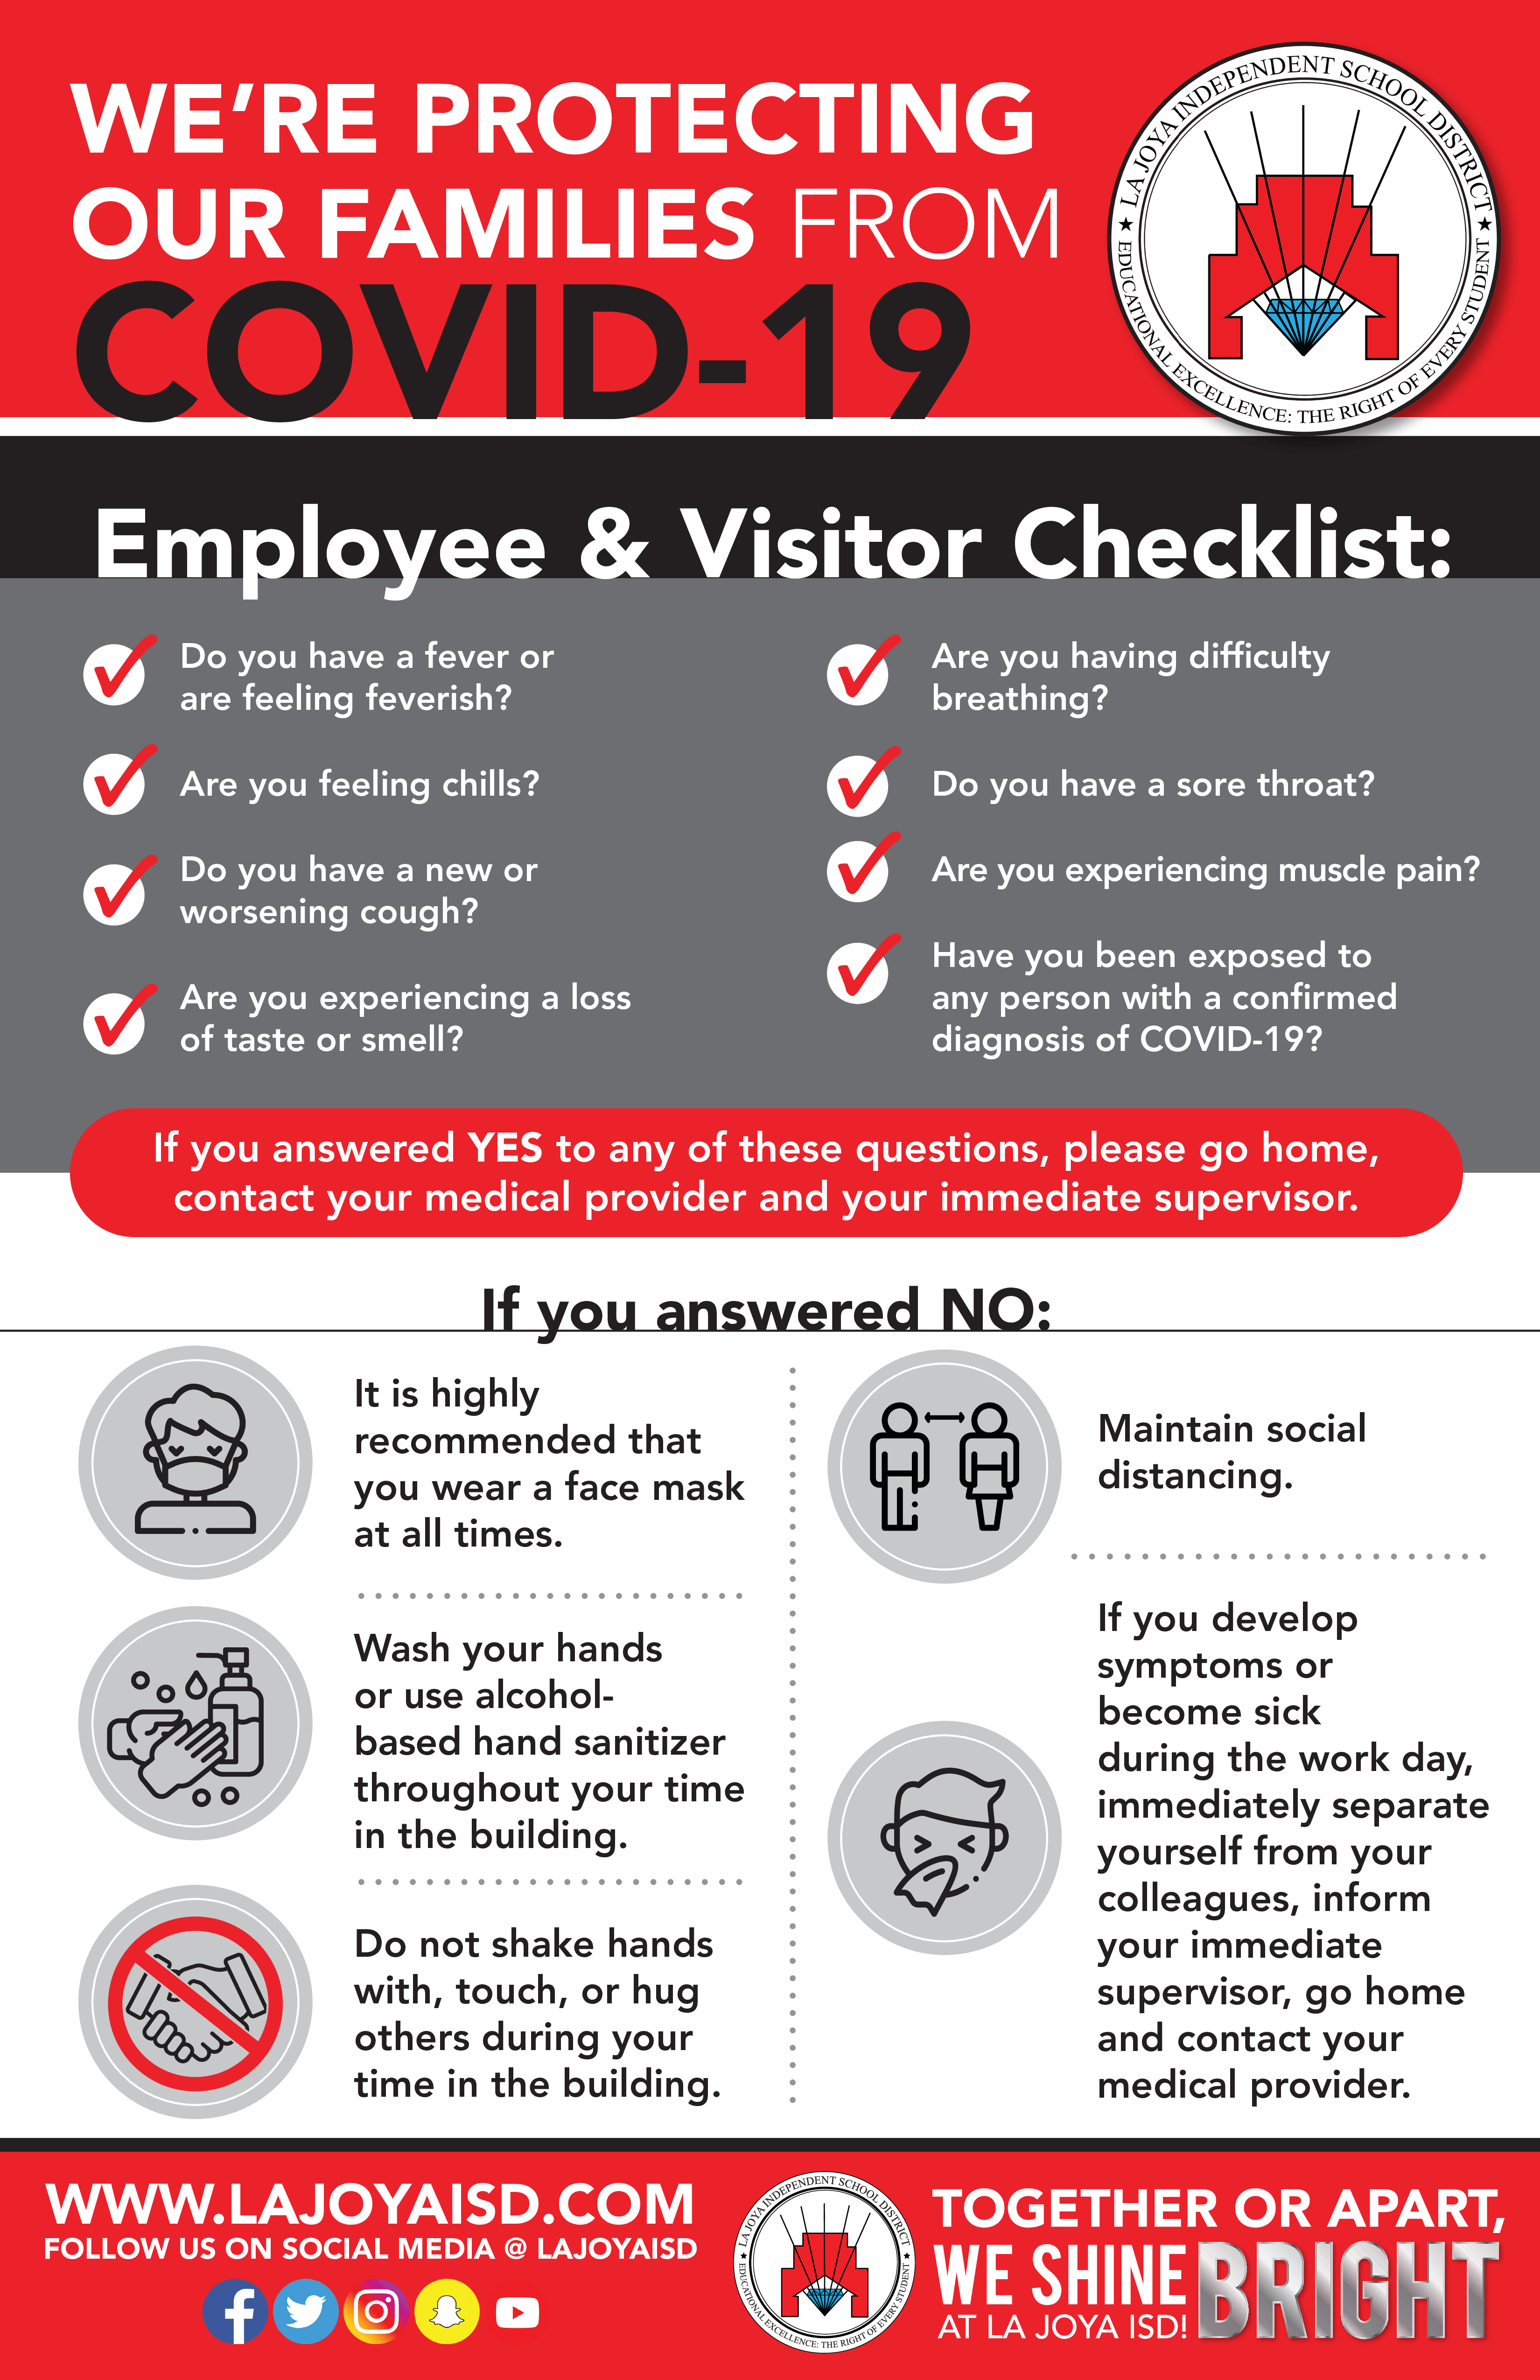 Visitor Checklist